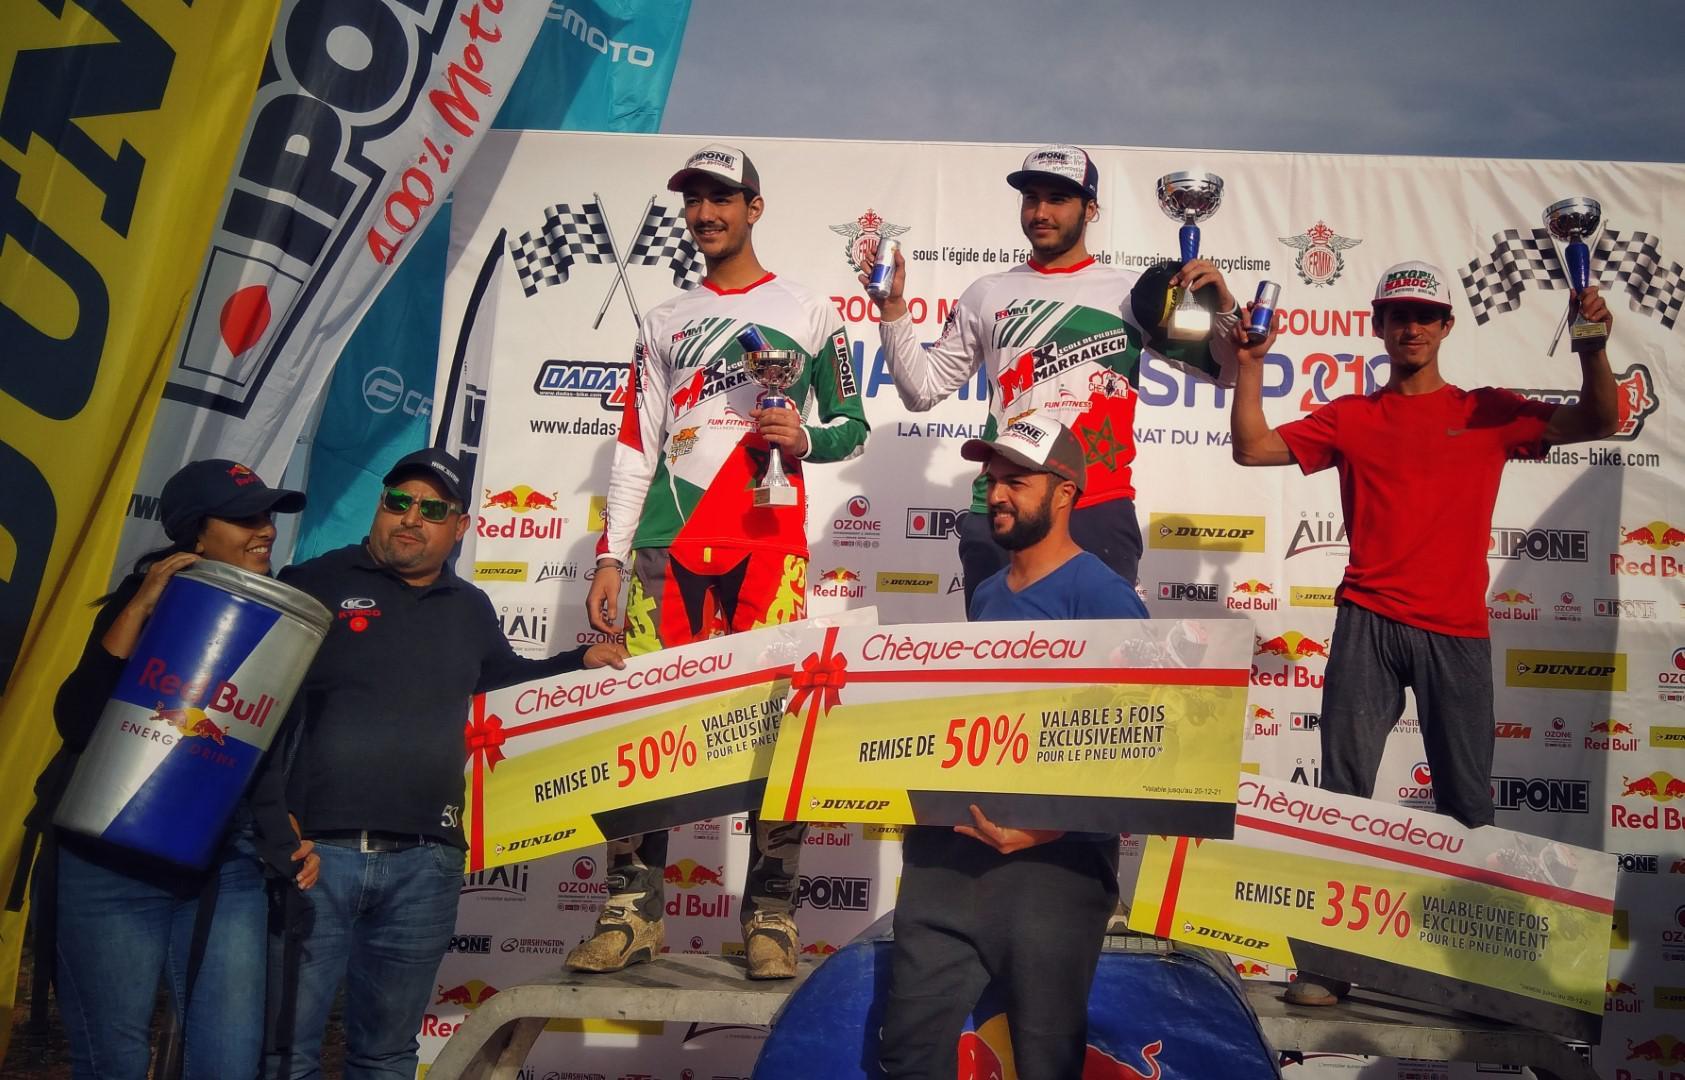 finale-du-championnat-du-maroc-de-motocross-et-cross-country-1164-2.jpg